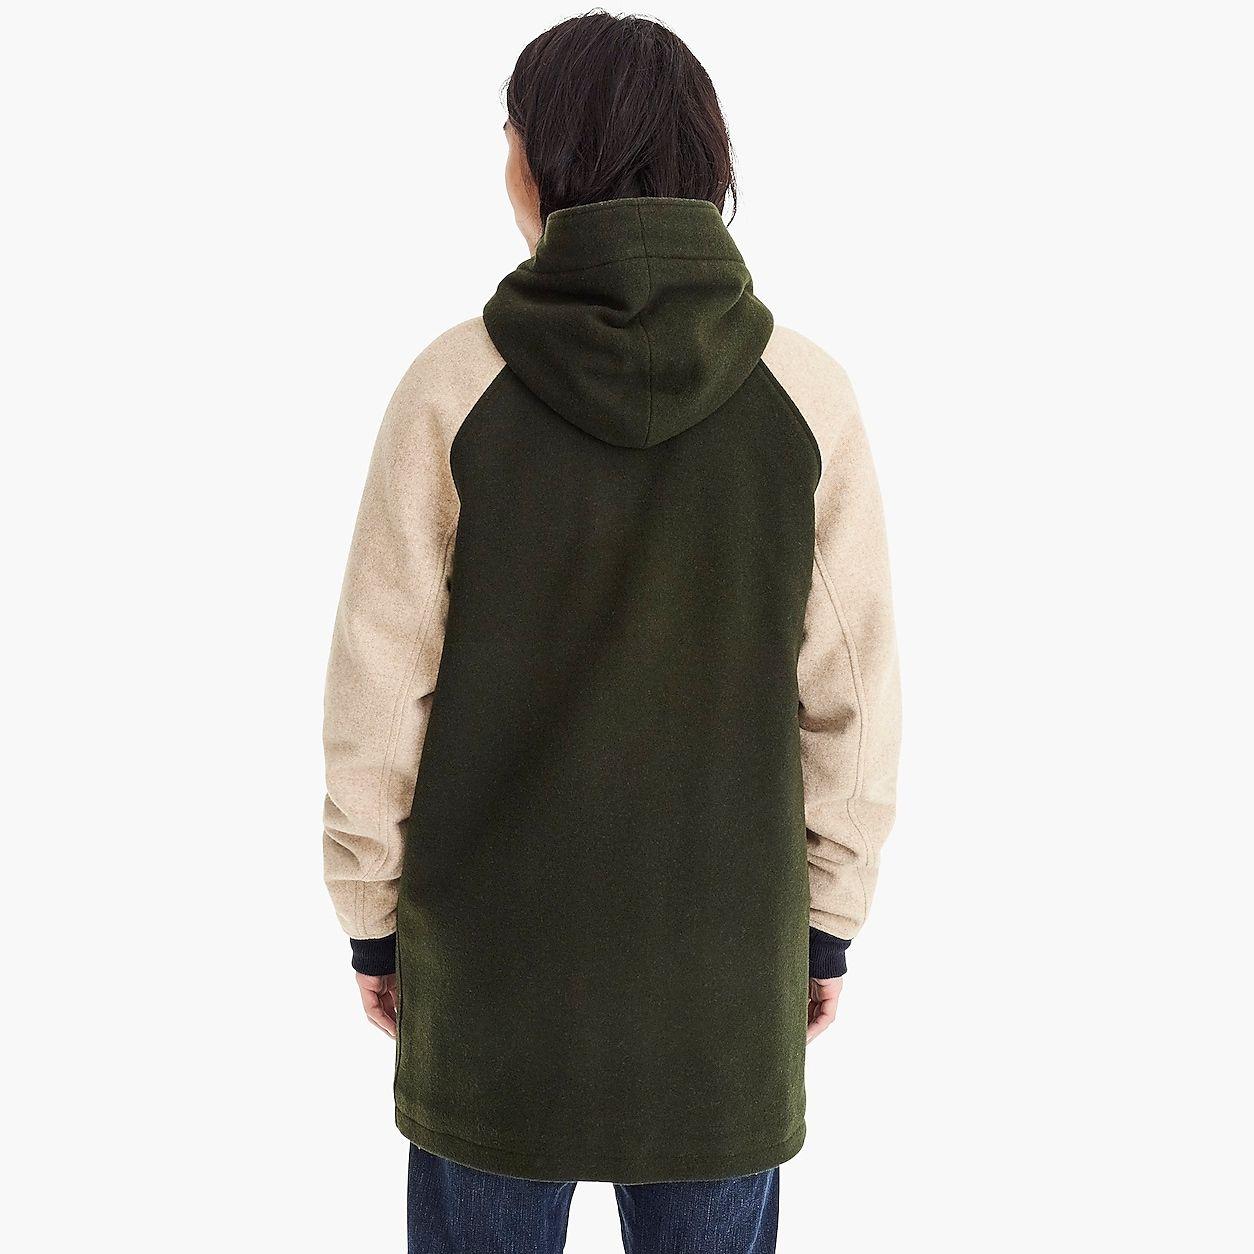 6278fa013f Wool-Nylon Sideline Jacket | Products | Jackets, Wool, Sweaters